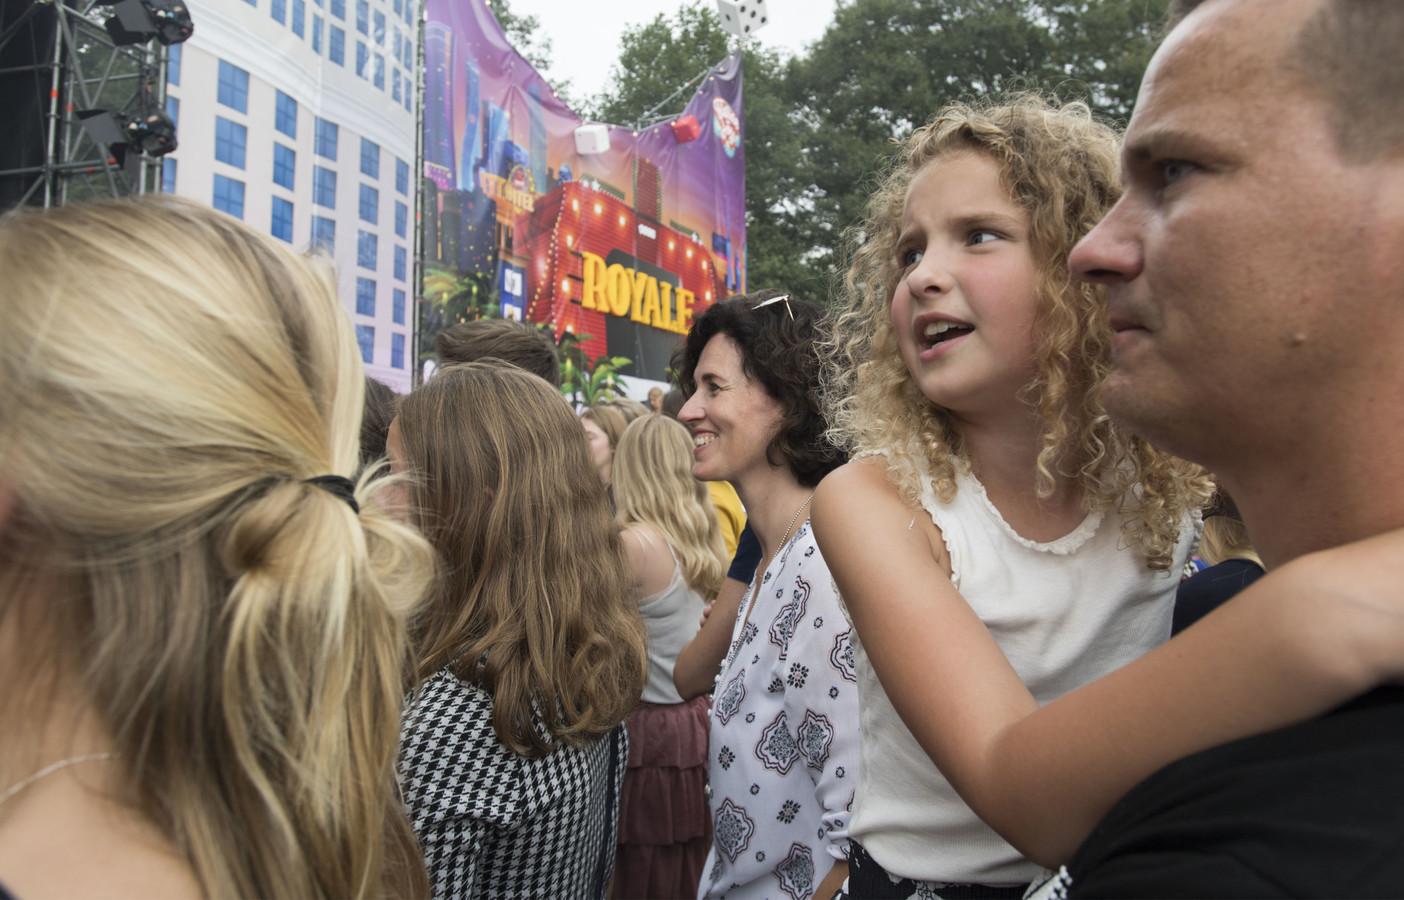 Evenementenbureau Maph, organisator van festival Fields of Joy, is failliet.